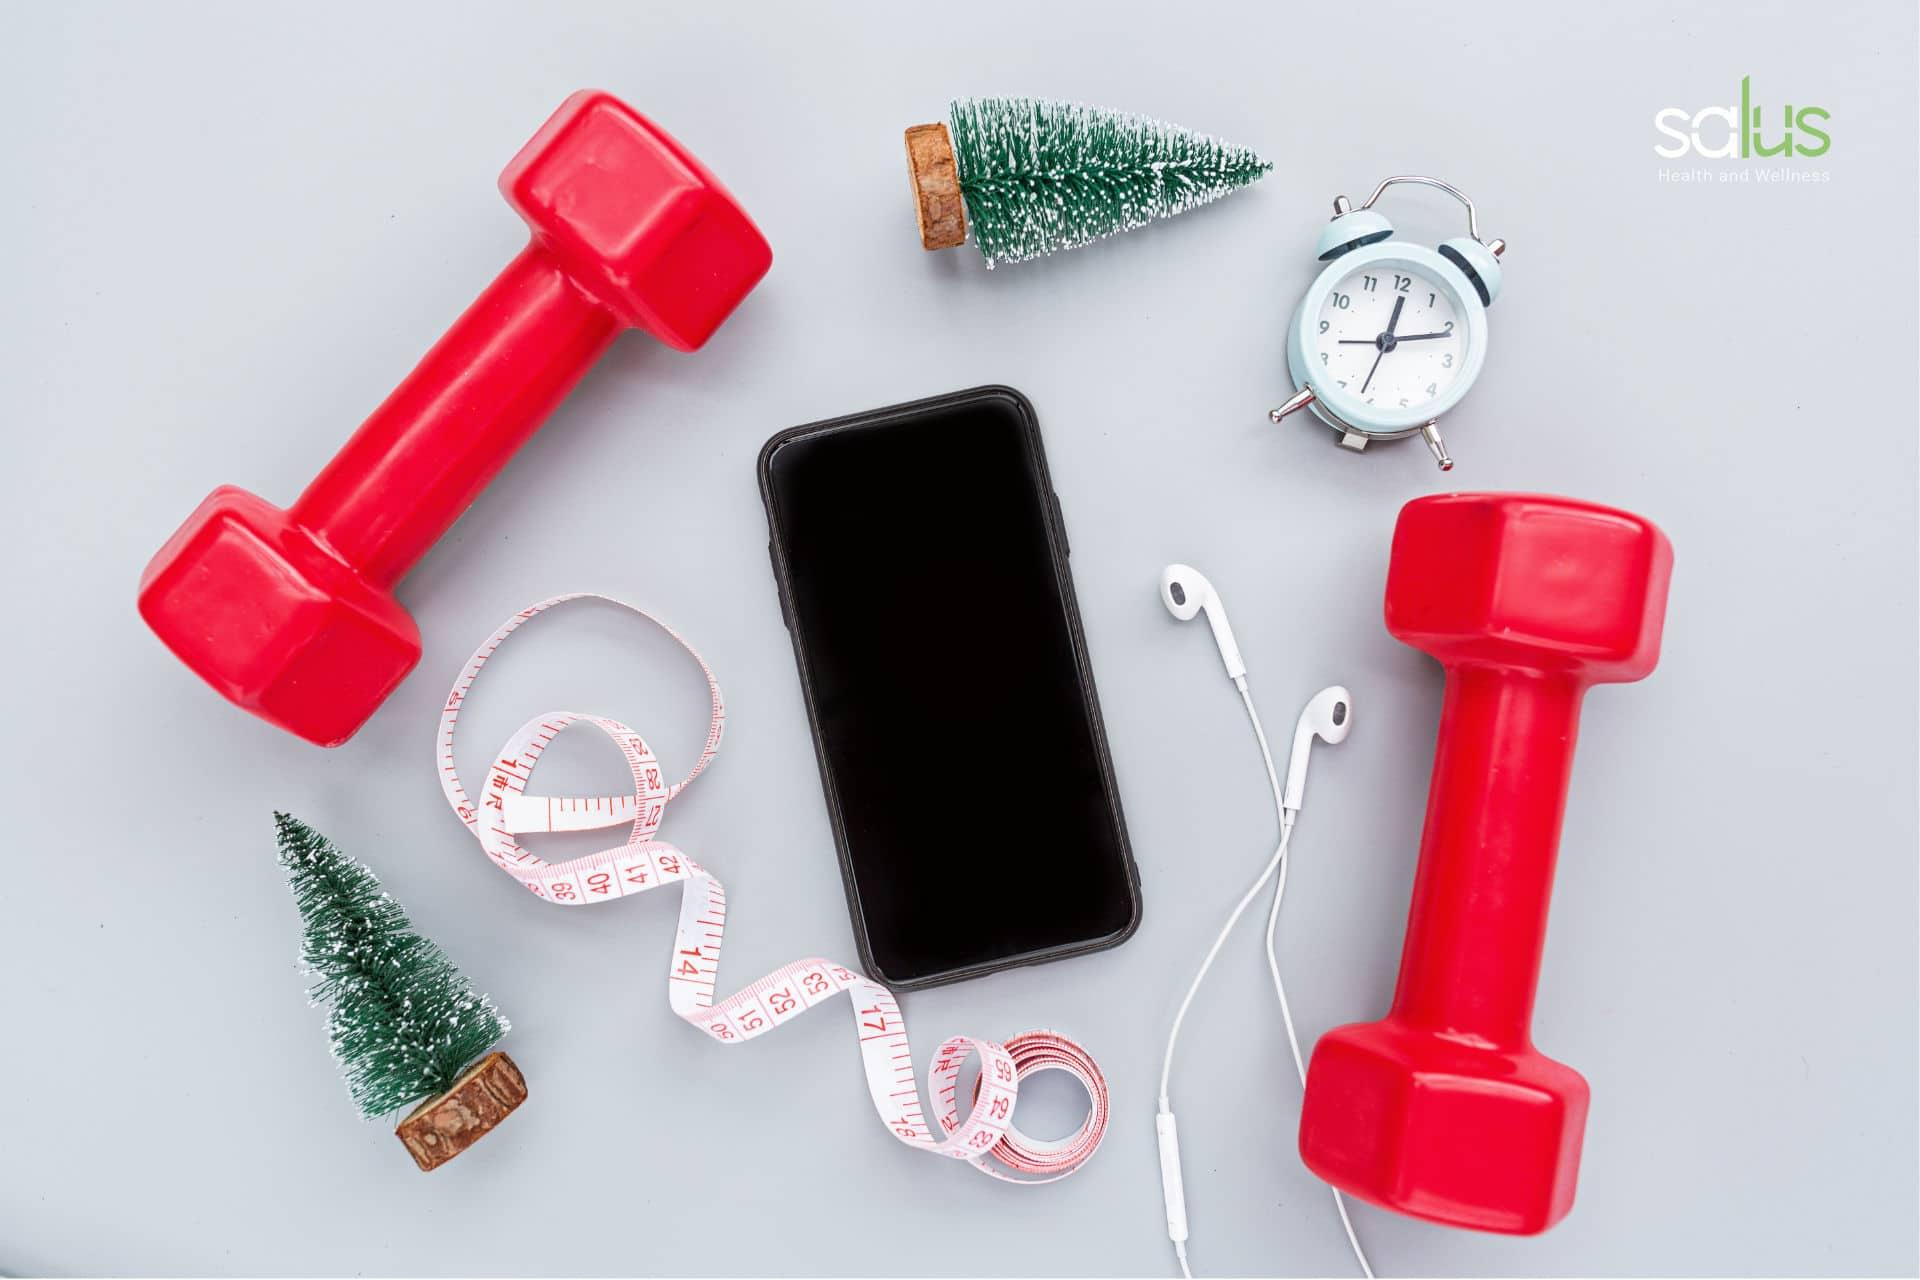 salus-blog-regali-natalizi-per-sportivi